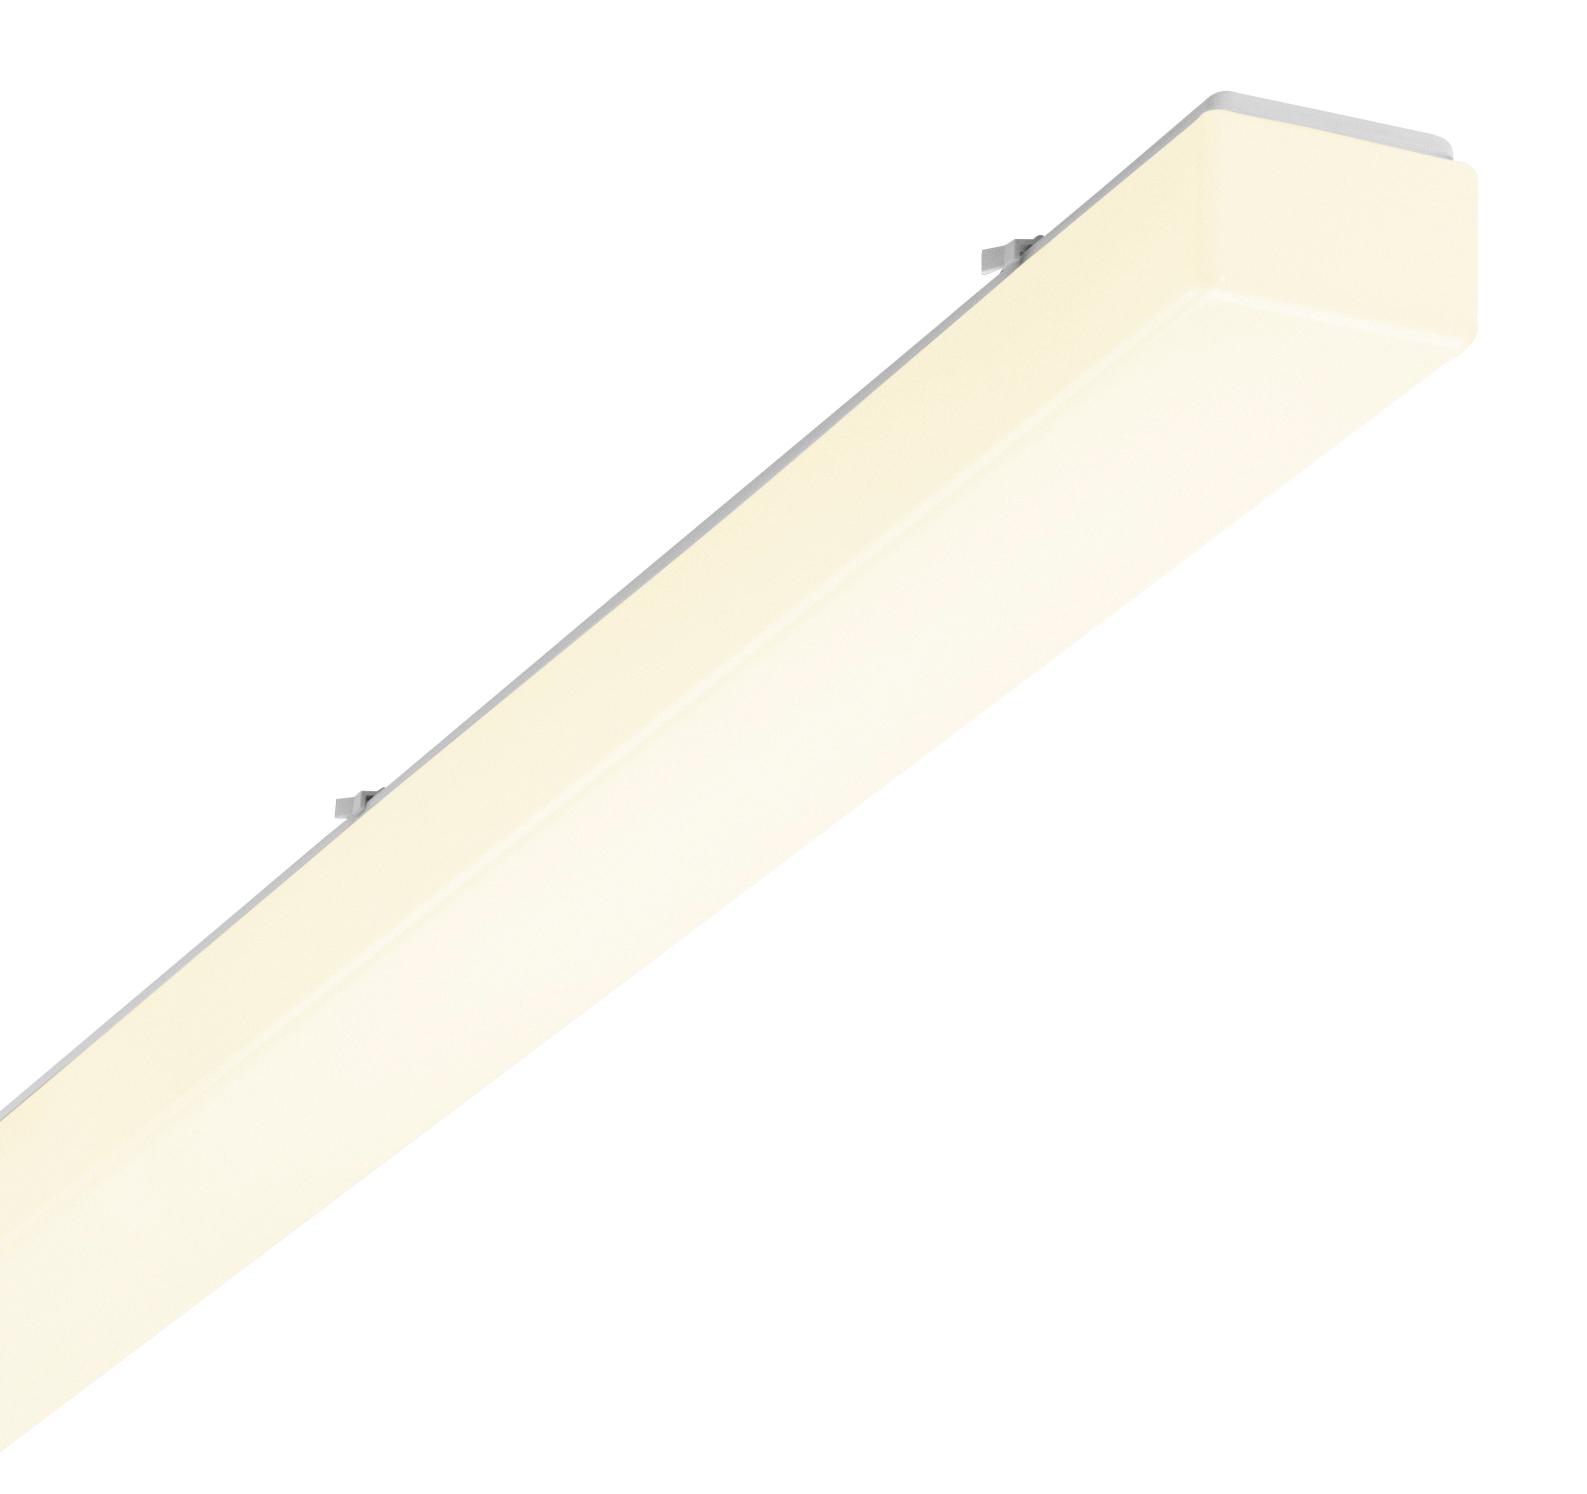 1 Stk AOT-O LED 25W, 4000K, IP50, acryl, opal, weiß, L-650mm LI70102062